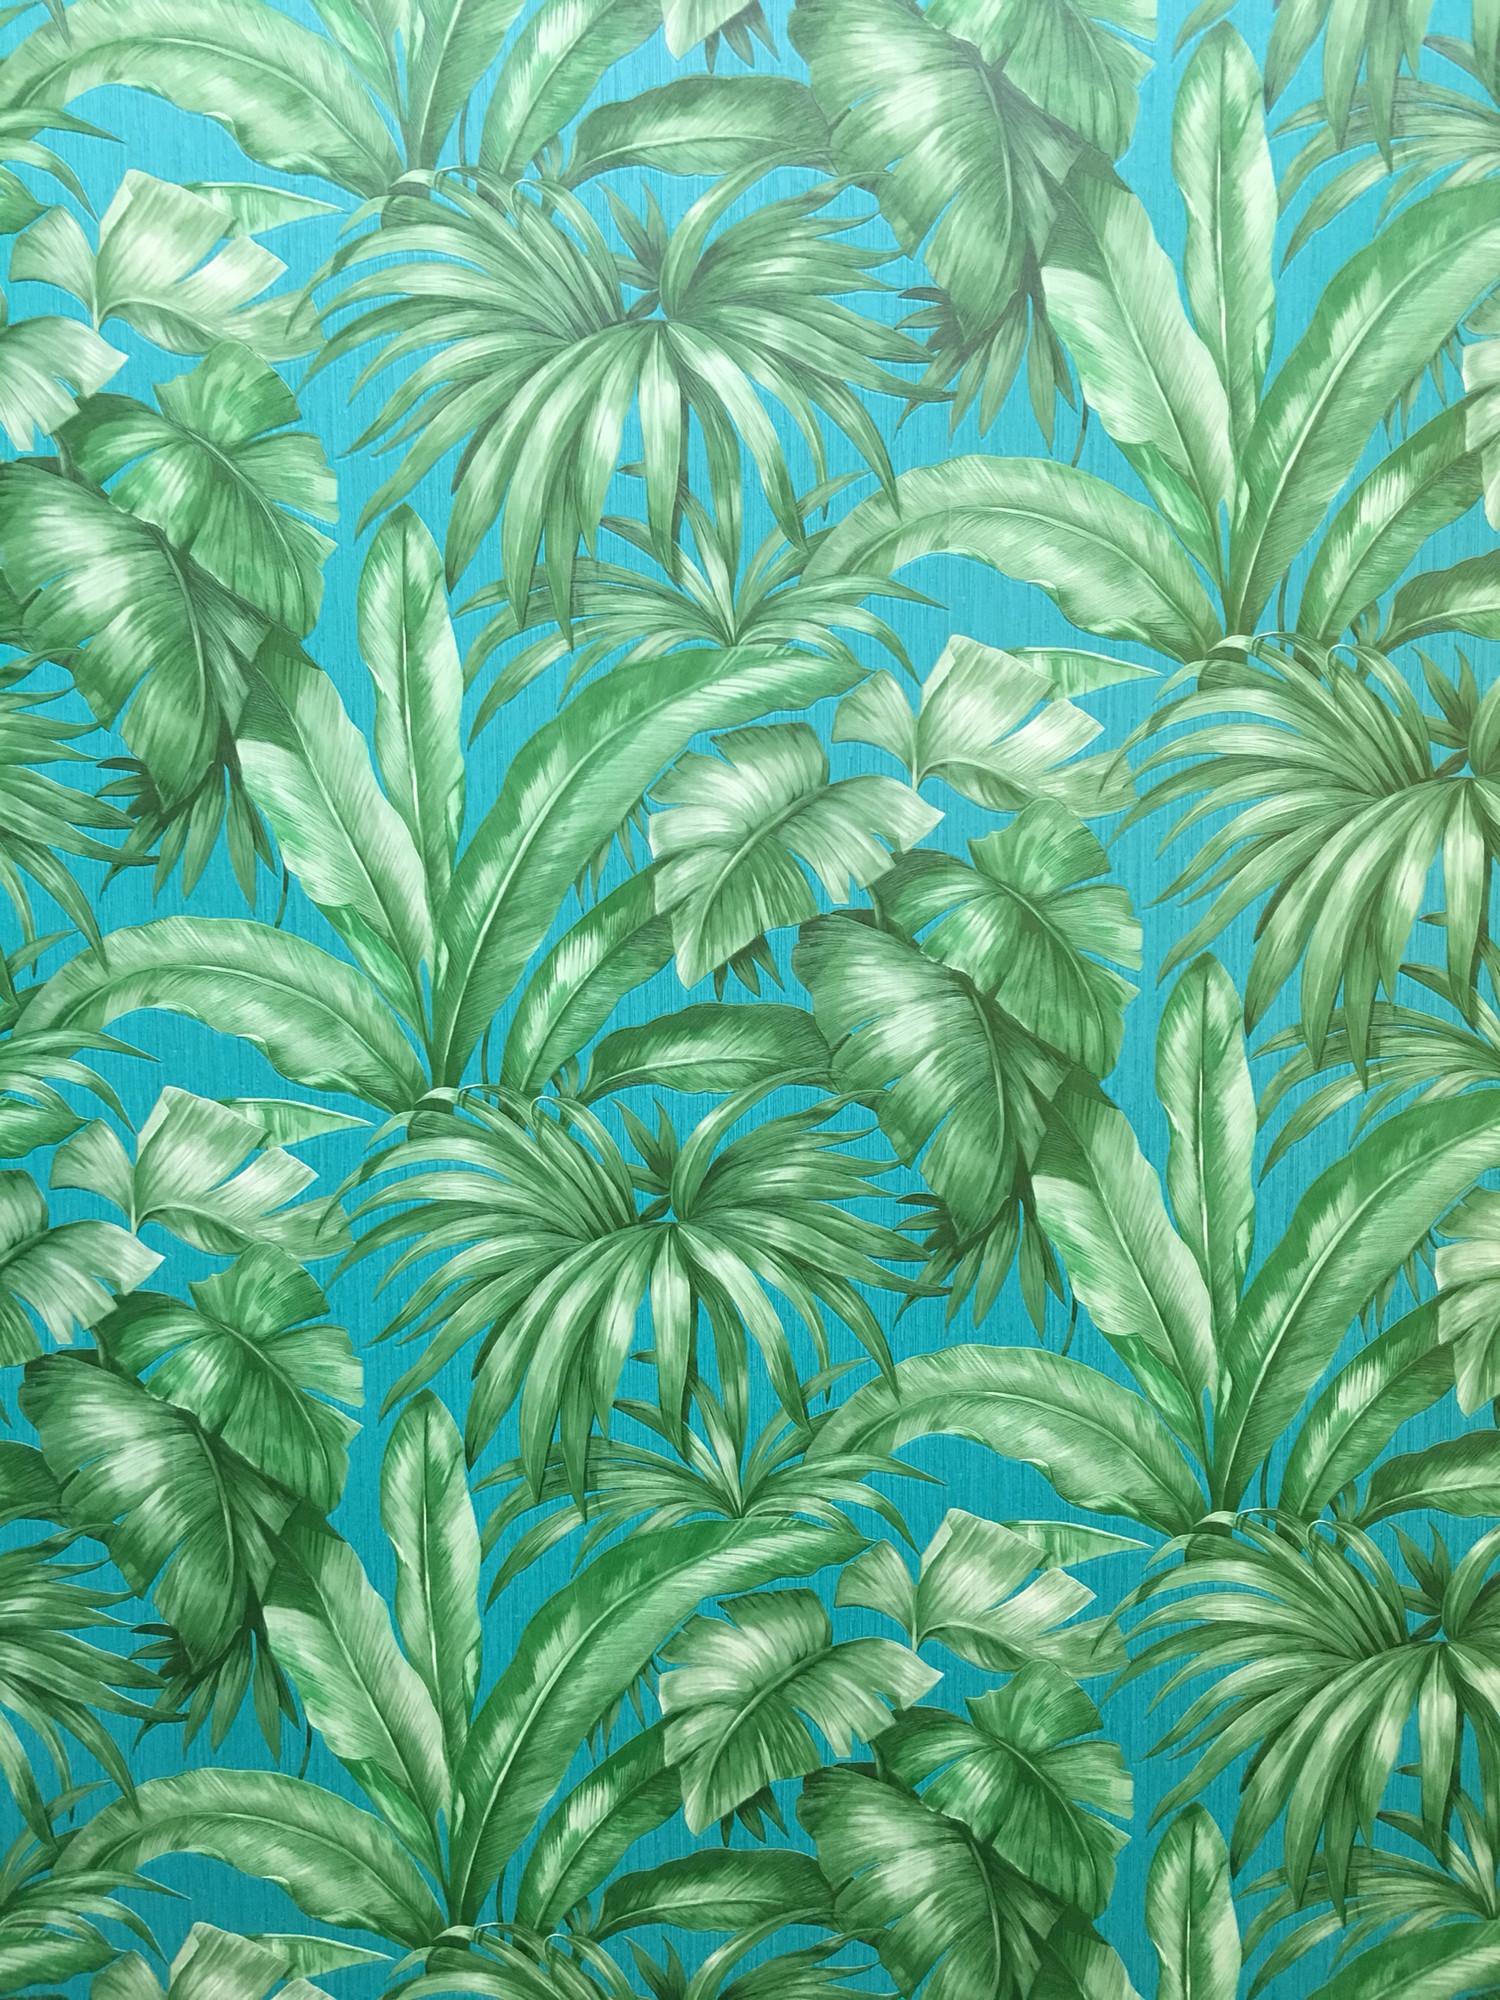 versace hd wallpaper  77  images